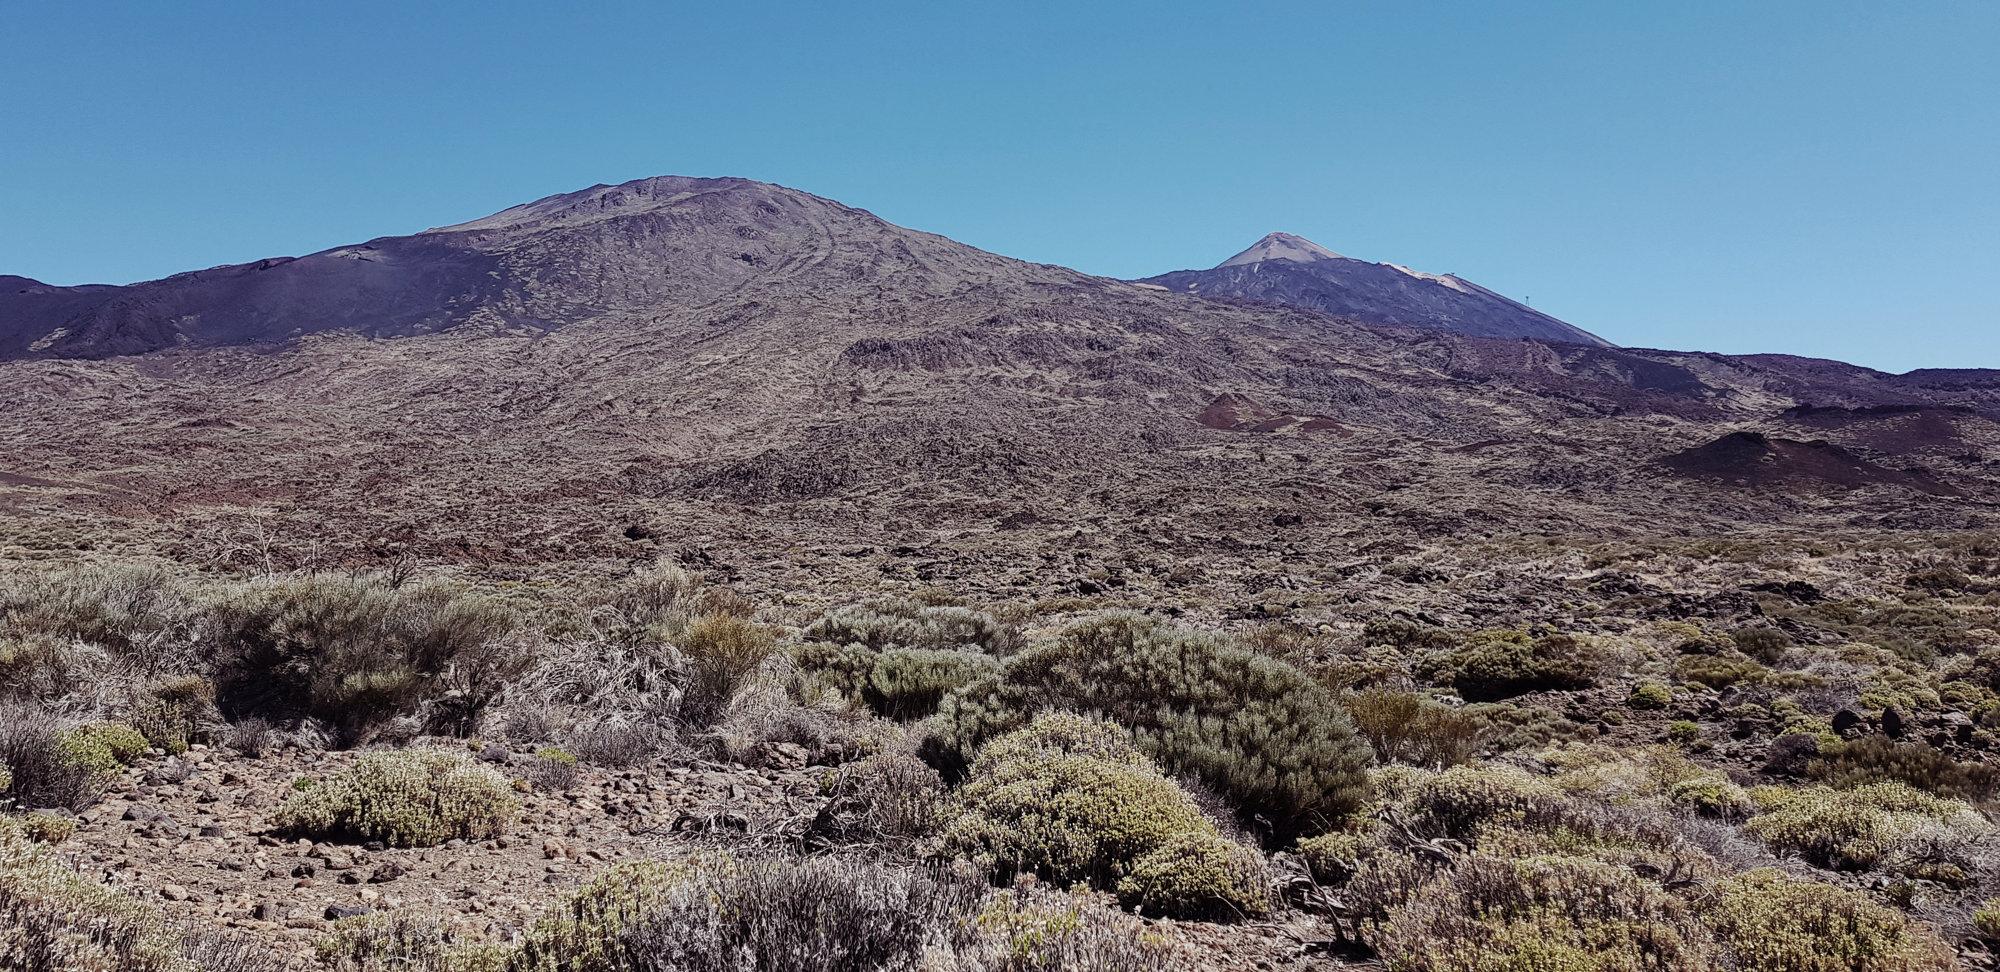 Blick auf den Pico Viejo und Pico del Teide